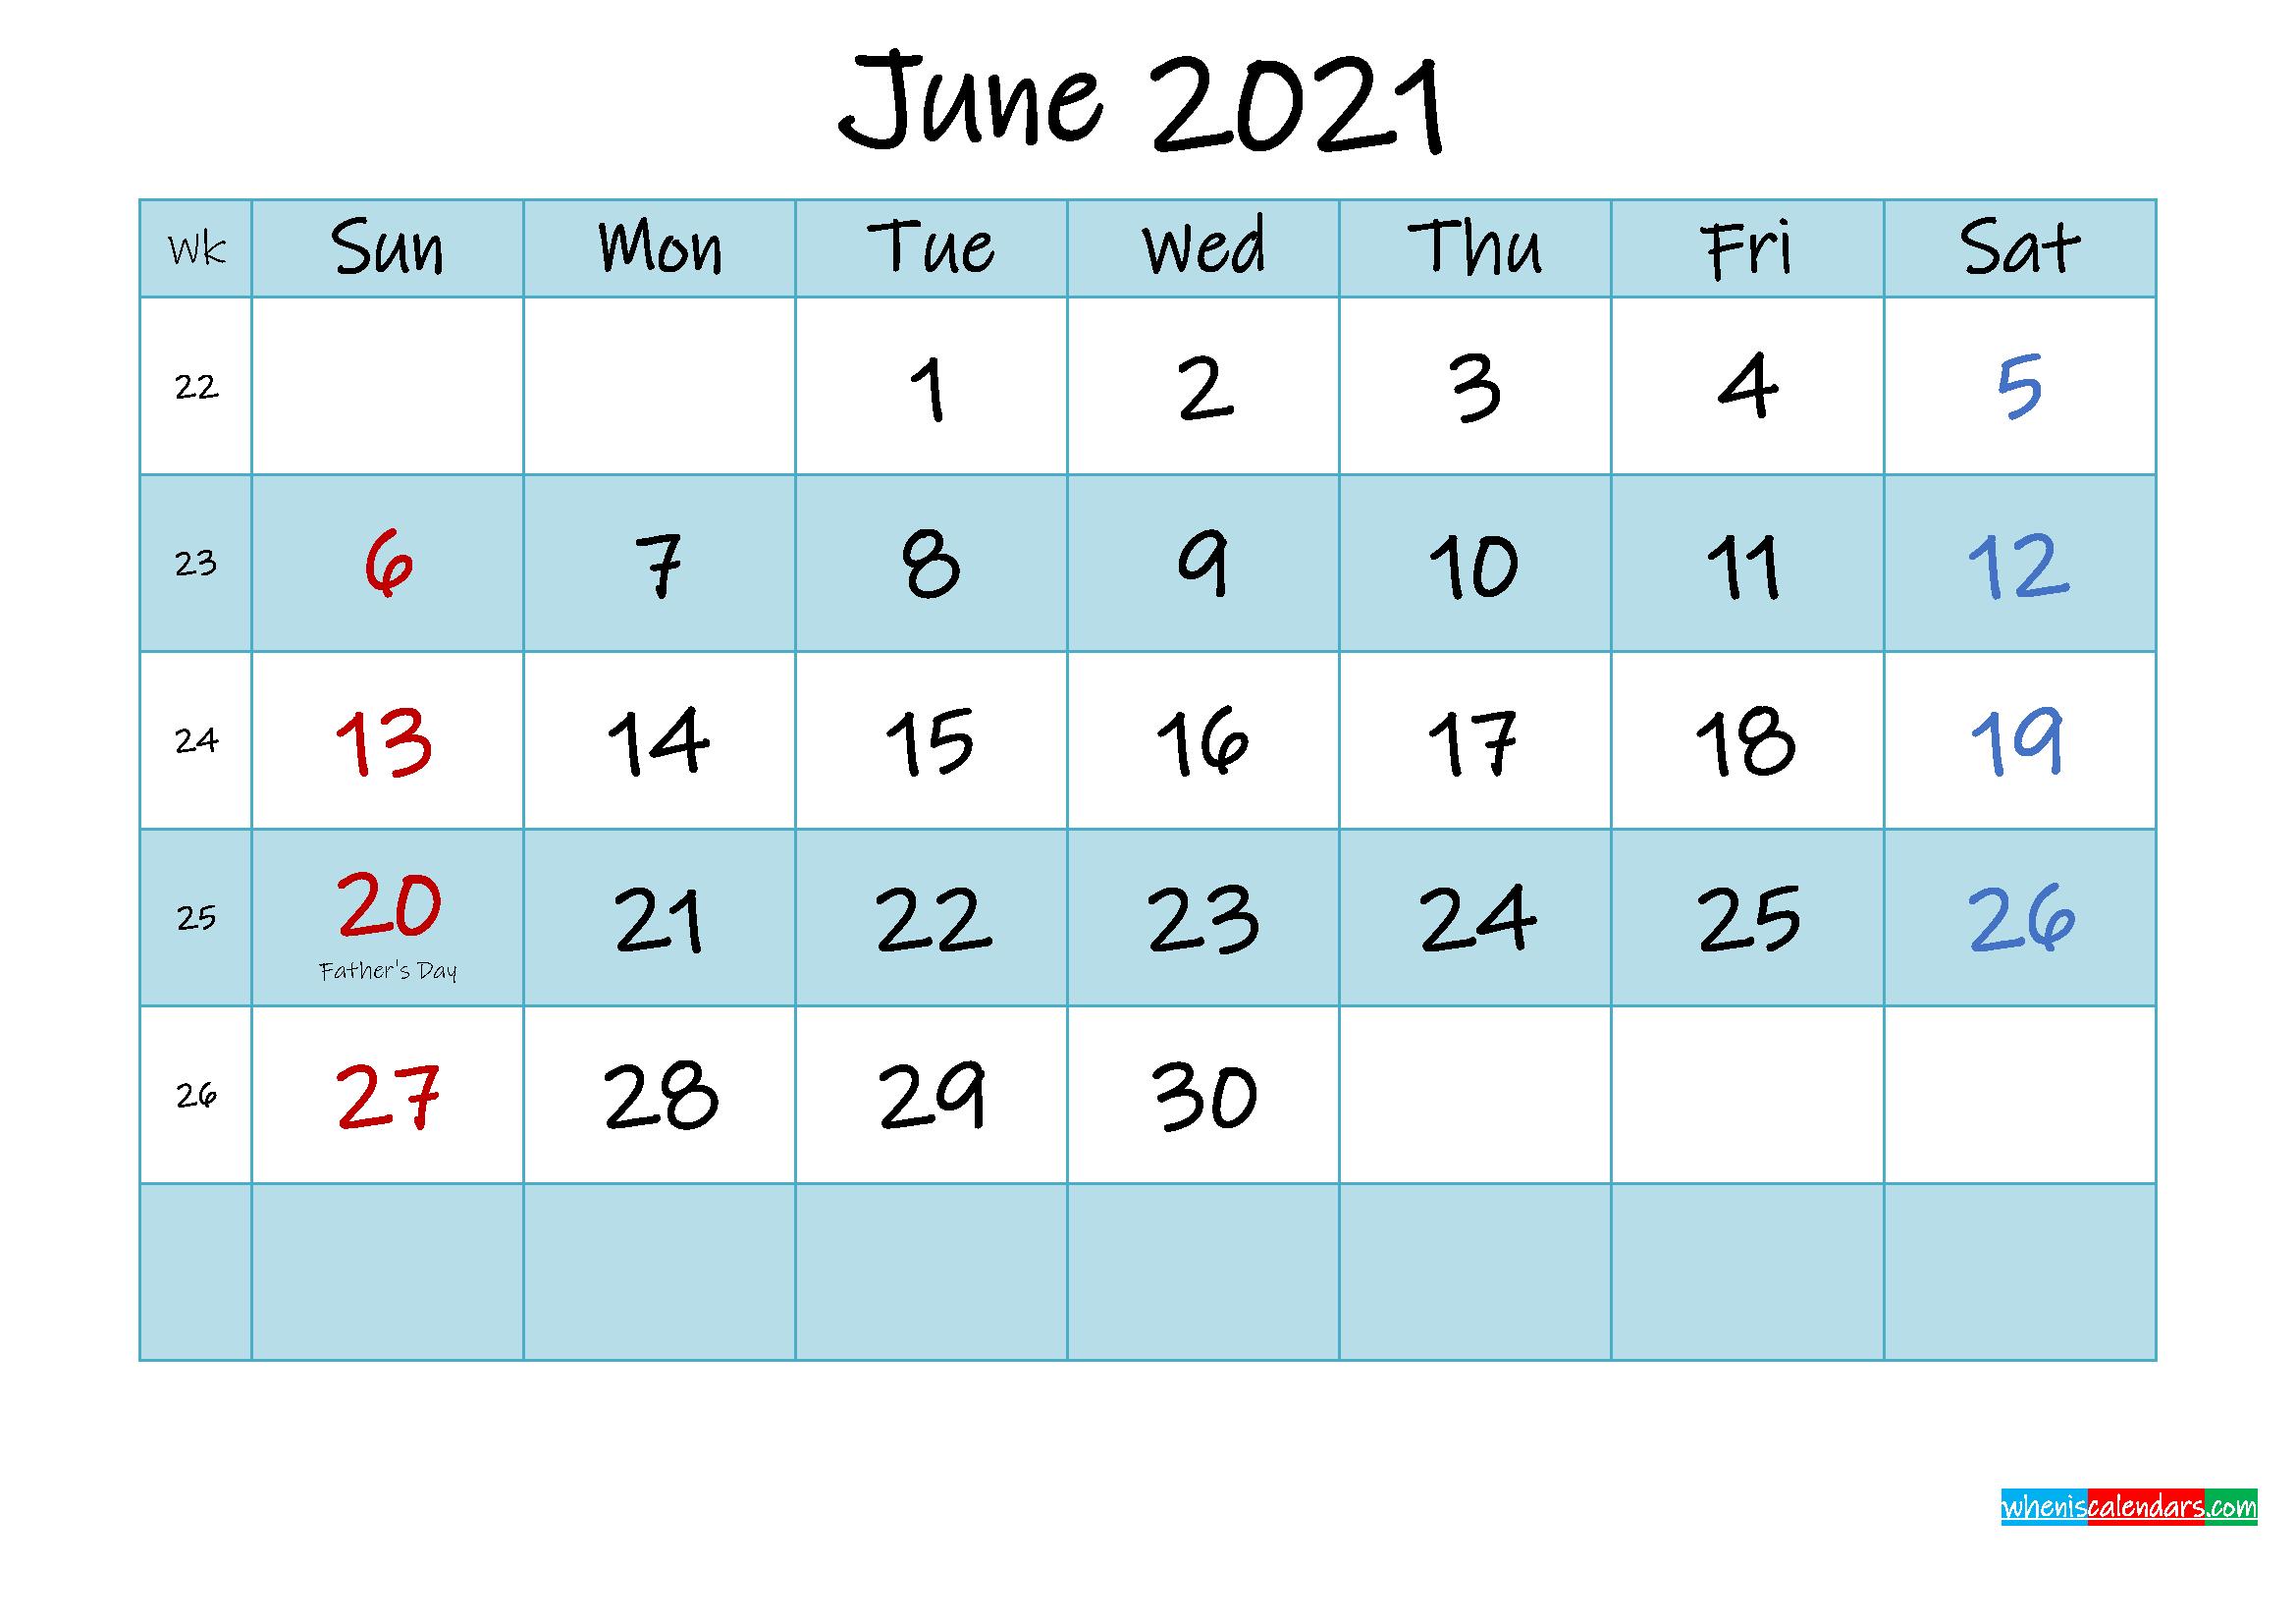 Printable June 2021 Calendar Word - Template No.ink21m474